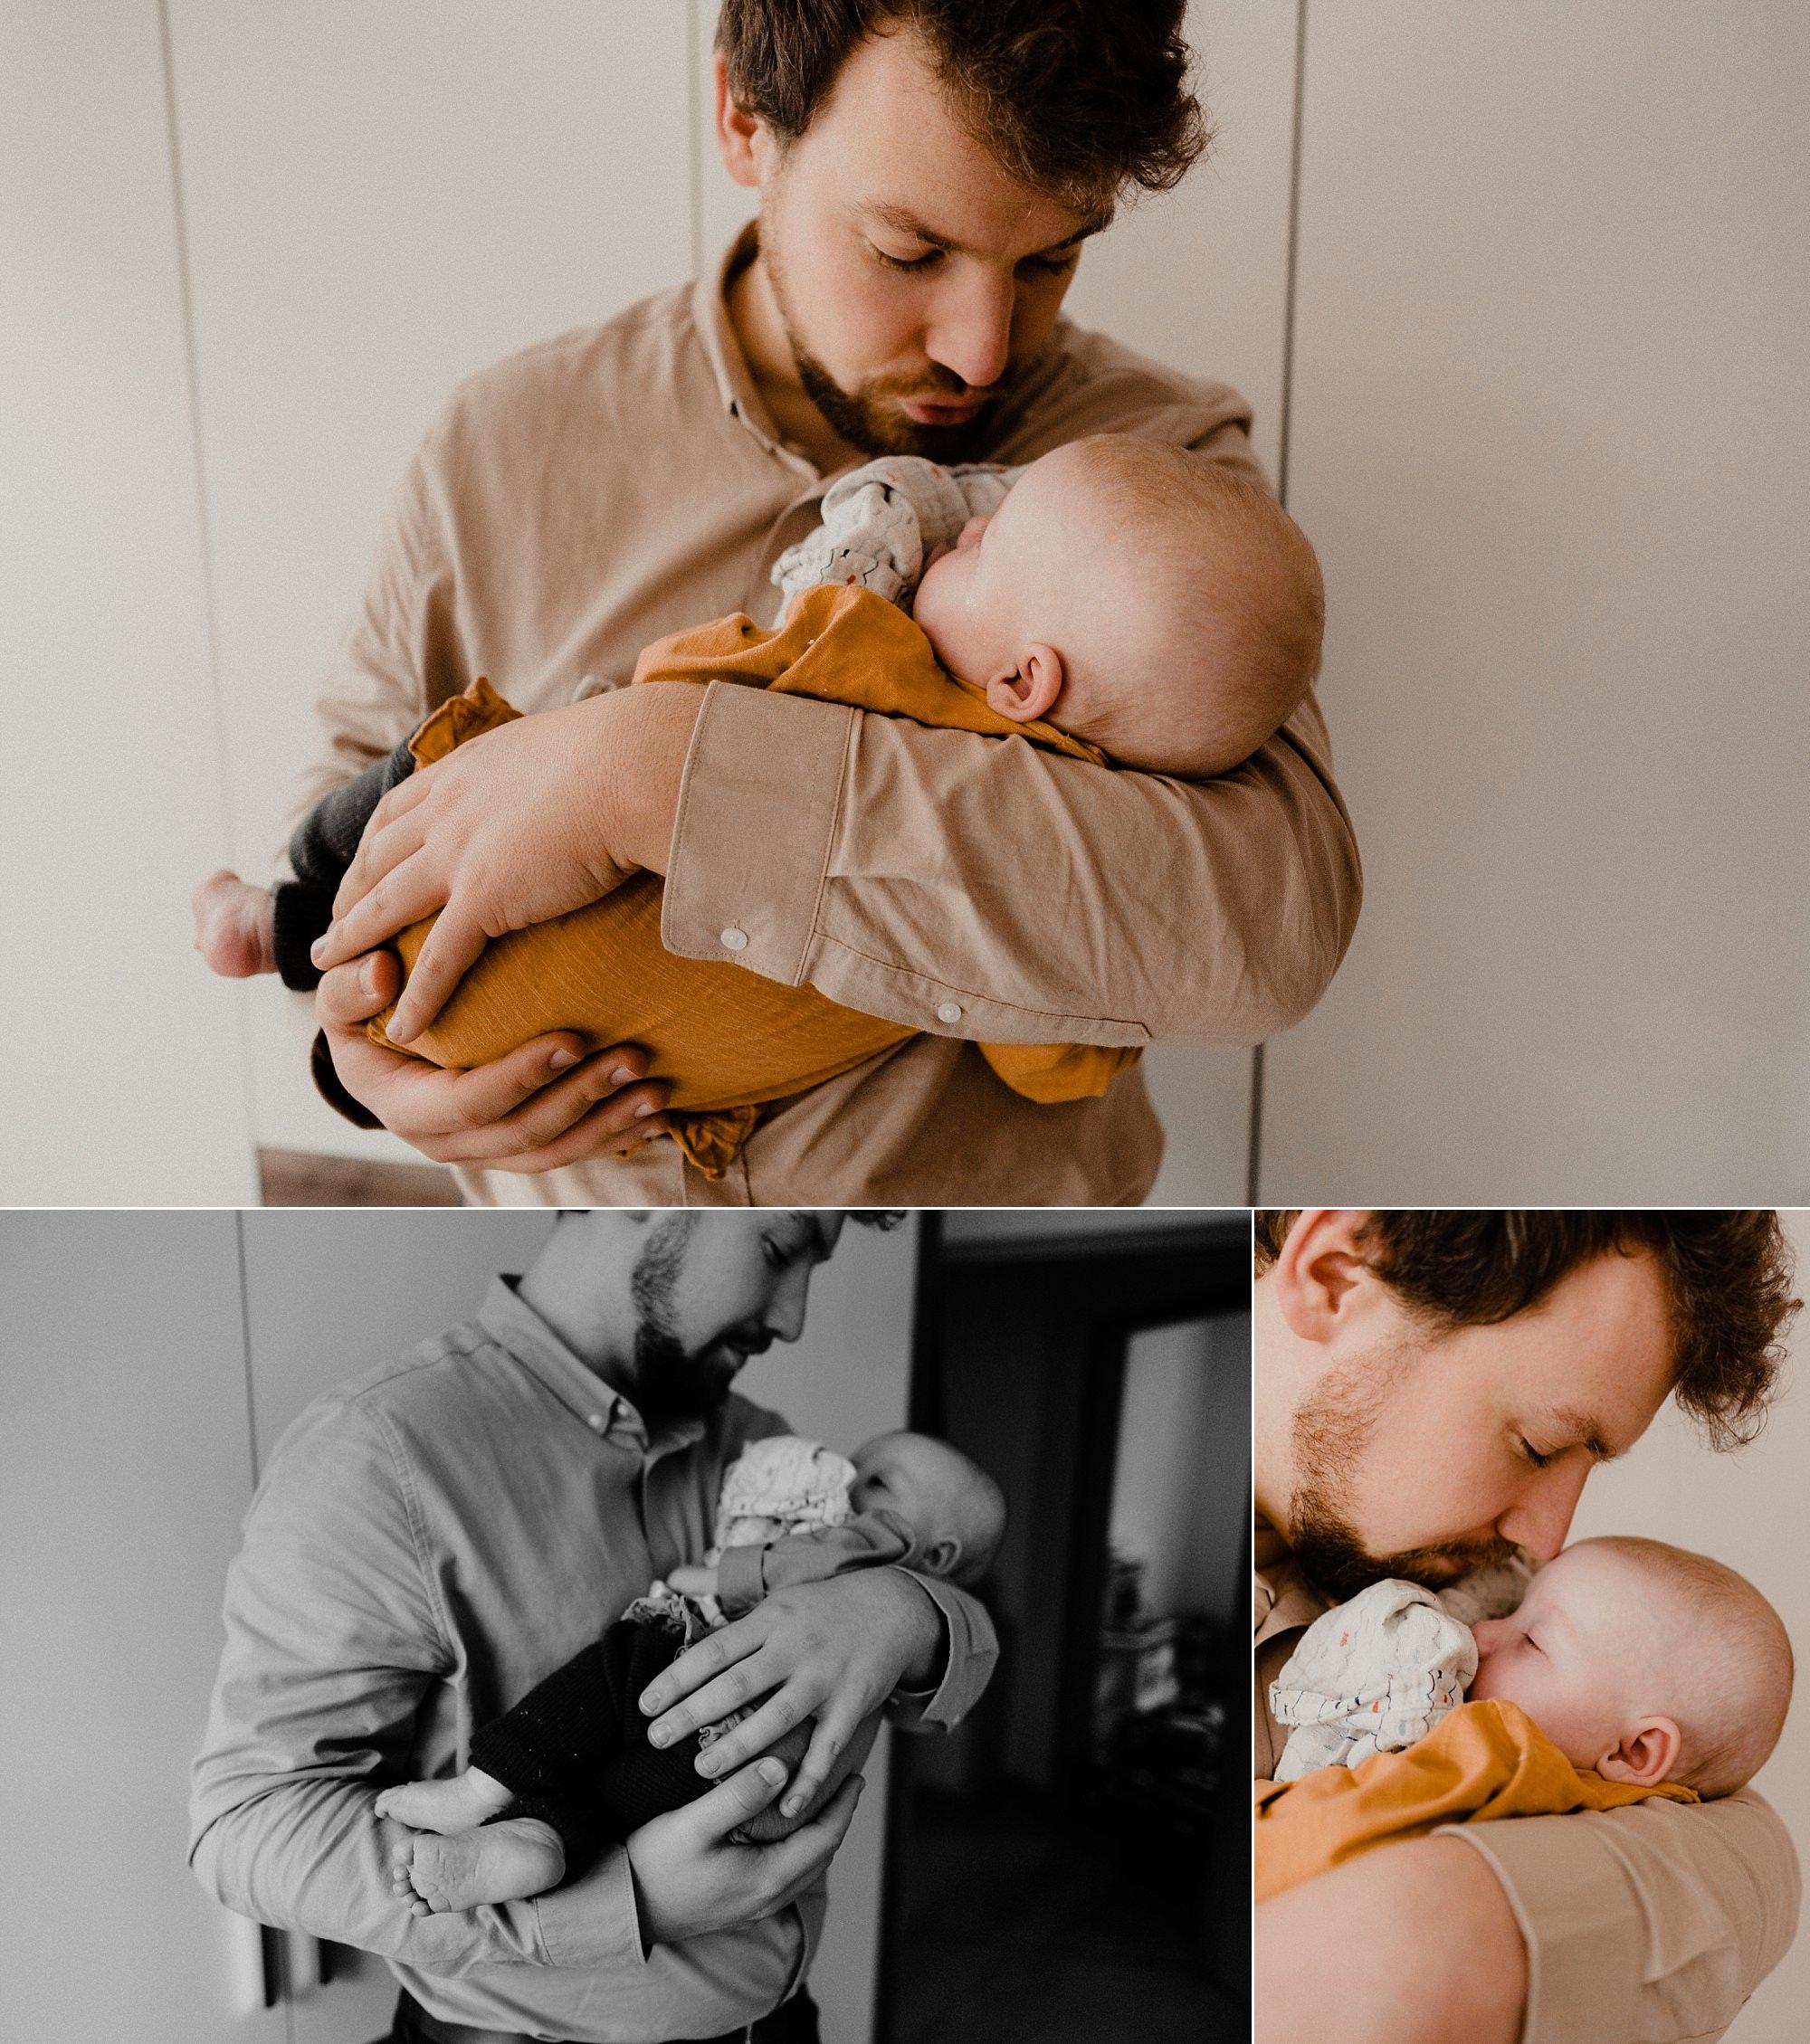 Fotograf - Stralsund - Zwillinge - Fotoshooting - Babyshooting - Greifswald - Fotograf - Rostock - Neugeborenenshooting - Fotoshooting - zu Hause - Homeshooting - Rügen